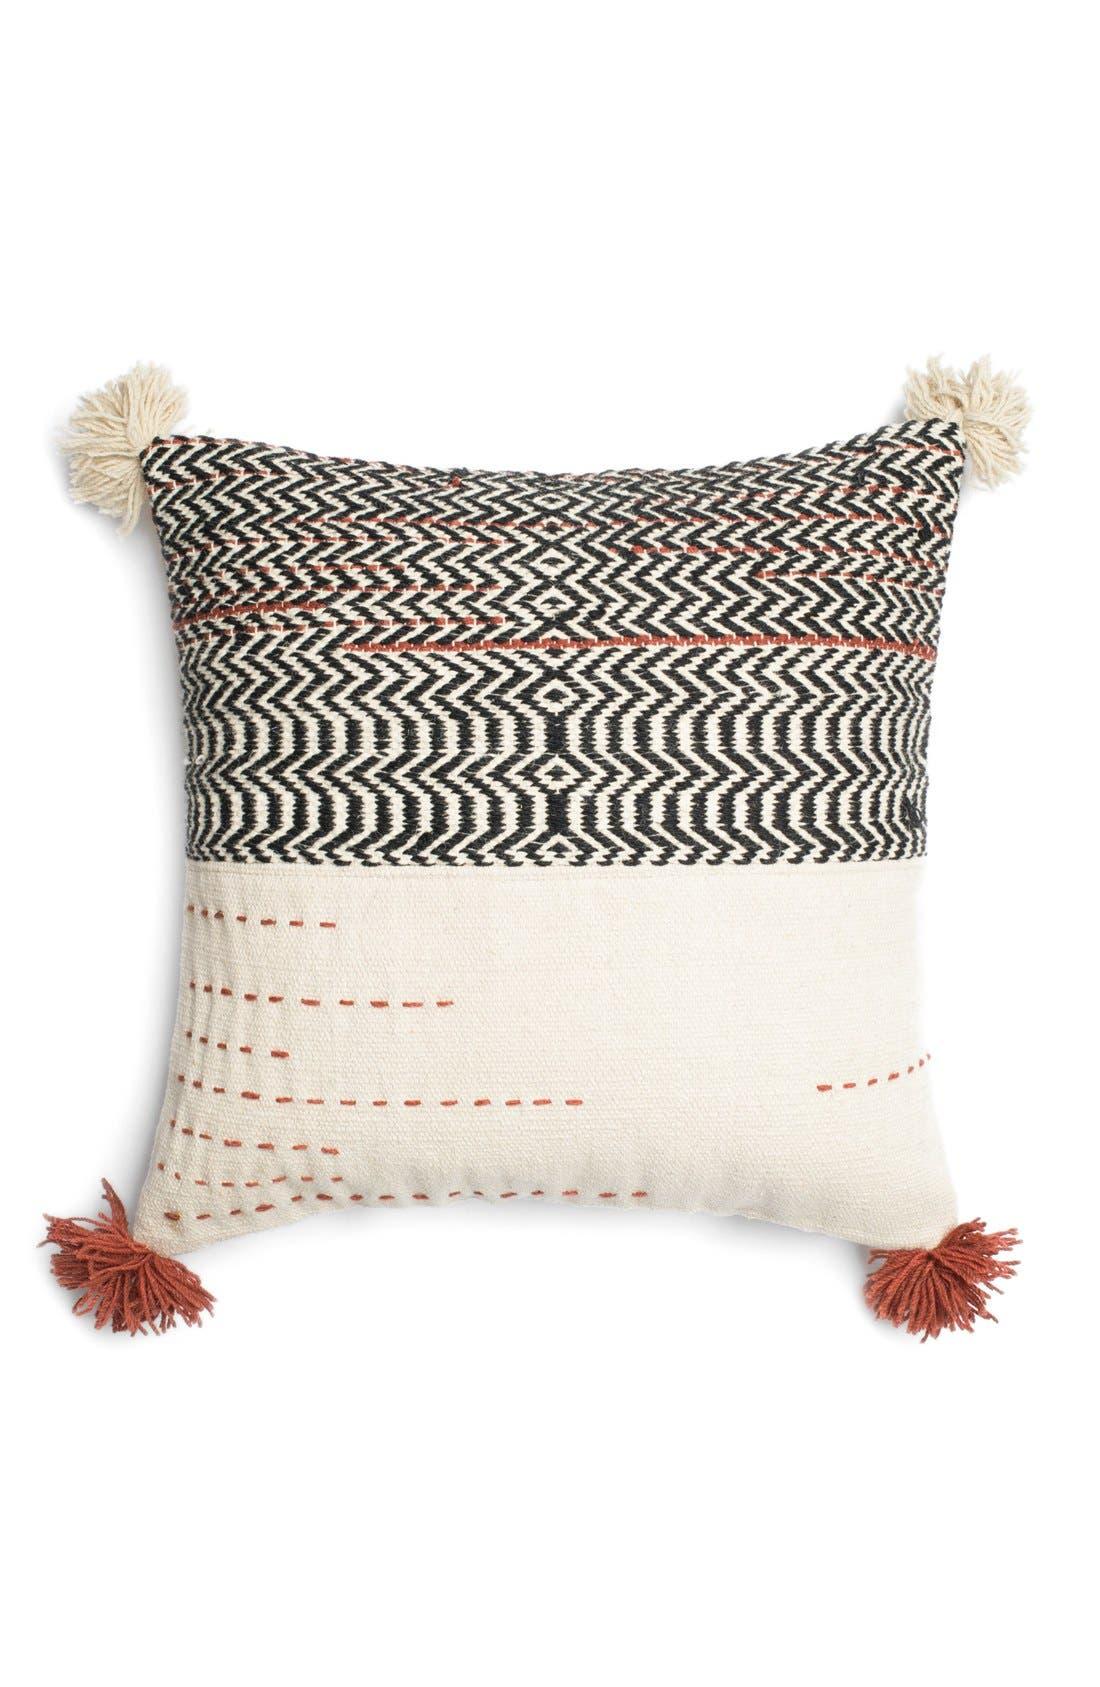 Woven Wool & Cotton Accent Pillow,                             Main thumbnail 1, color,                             001